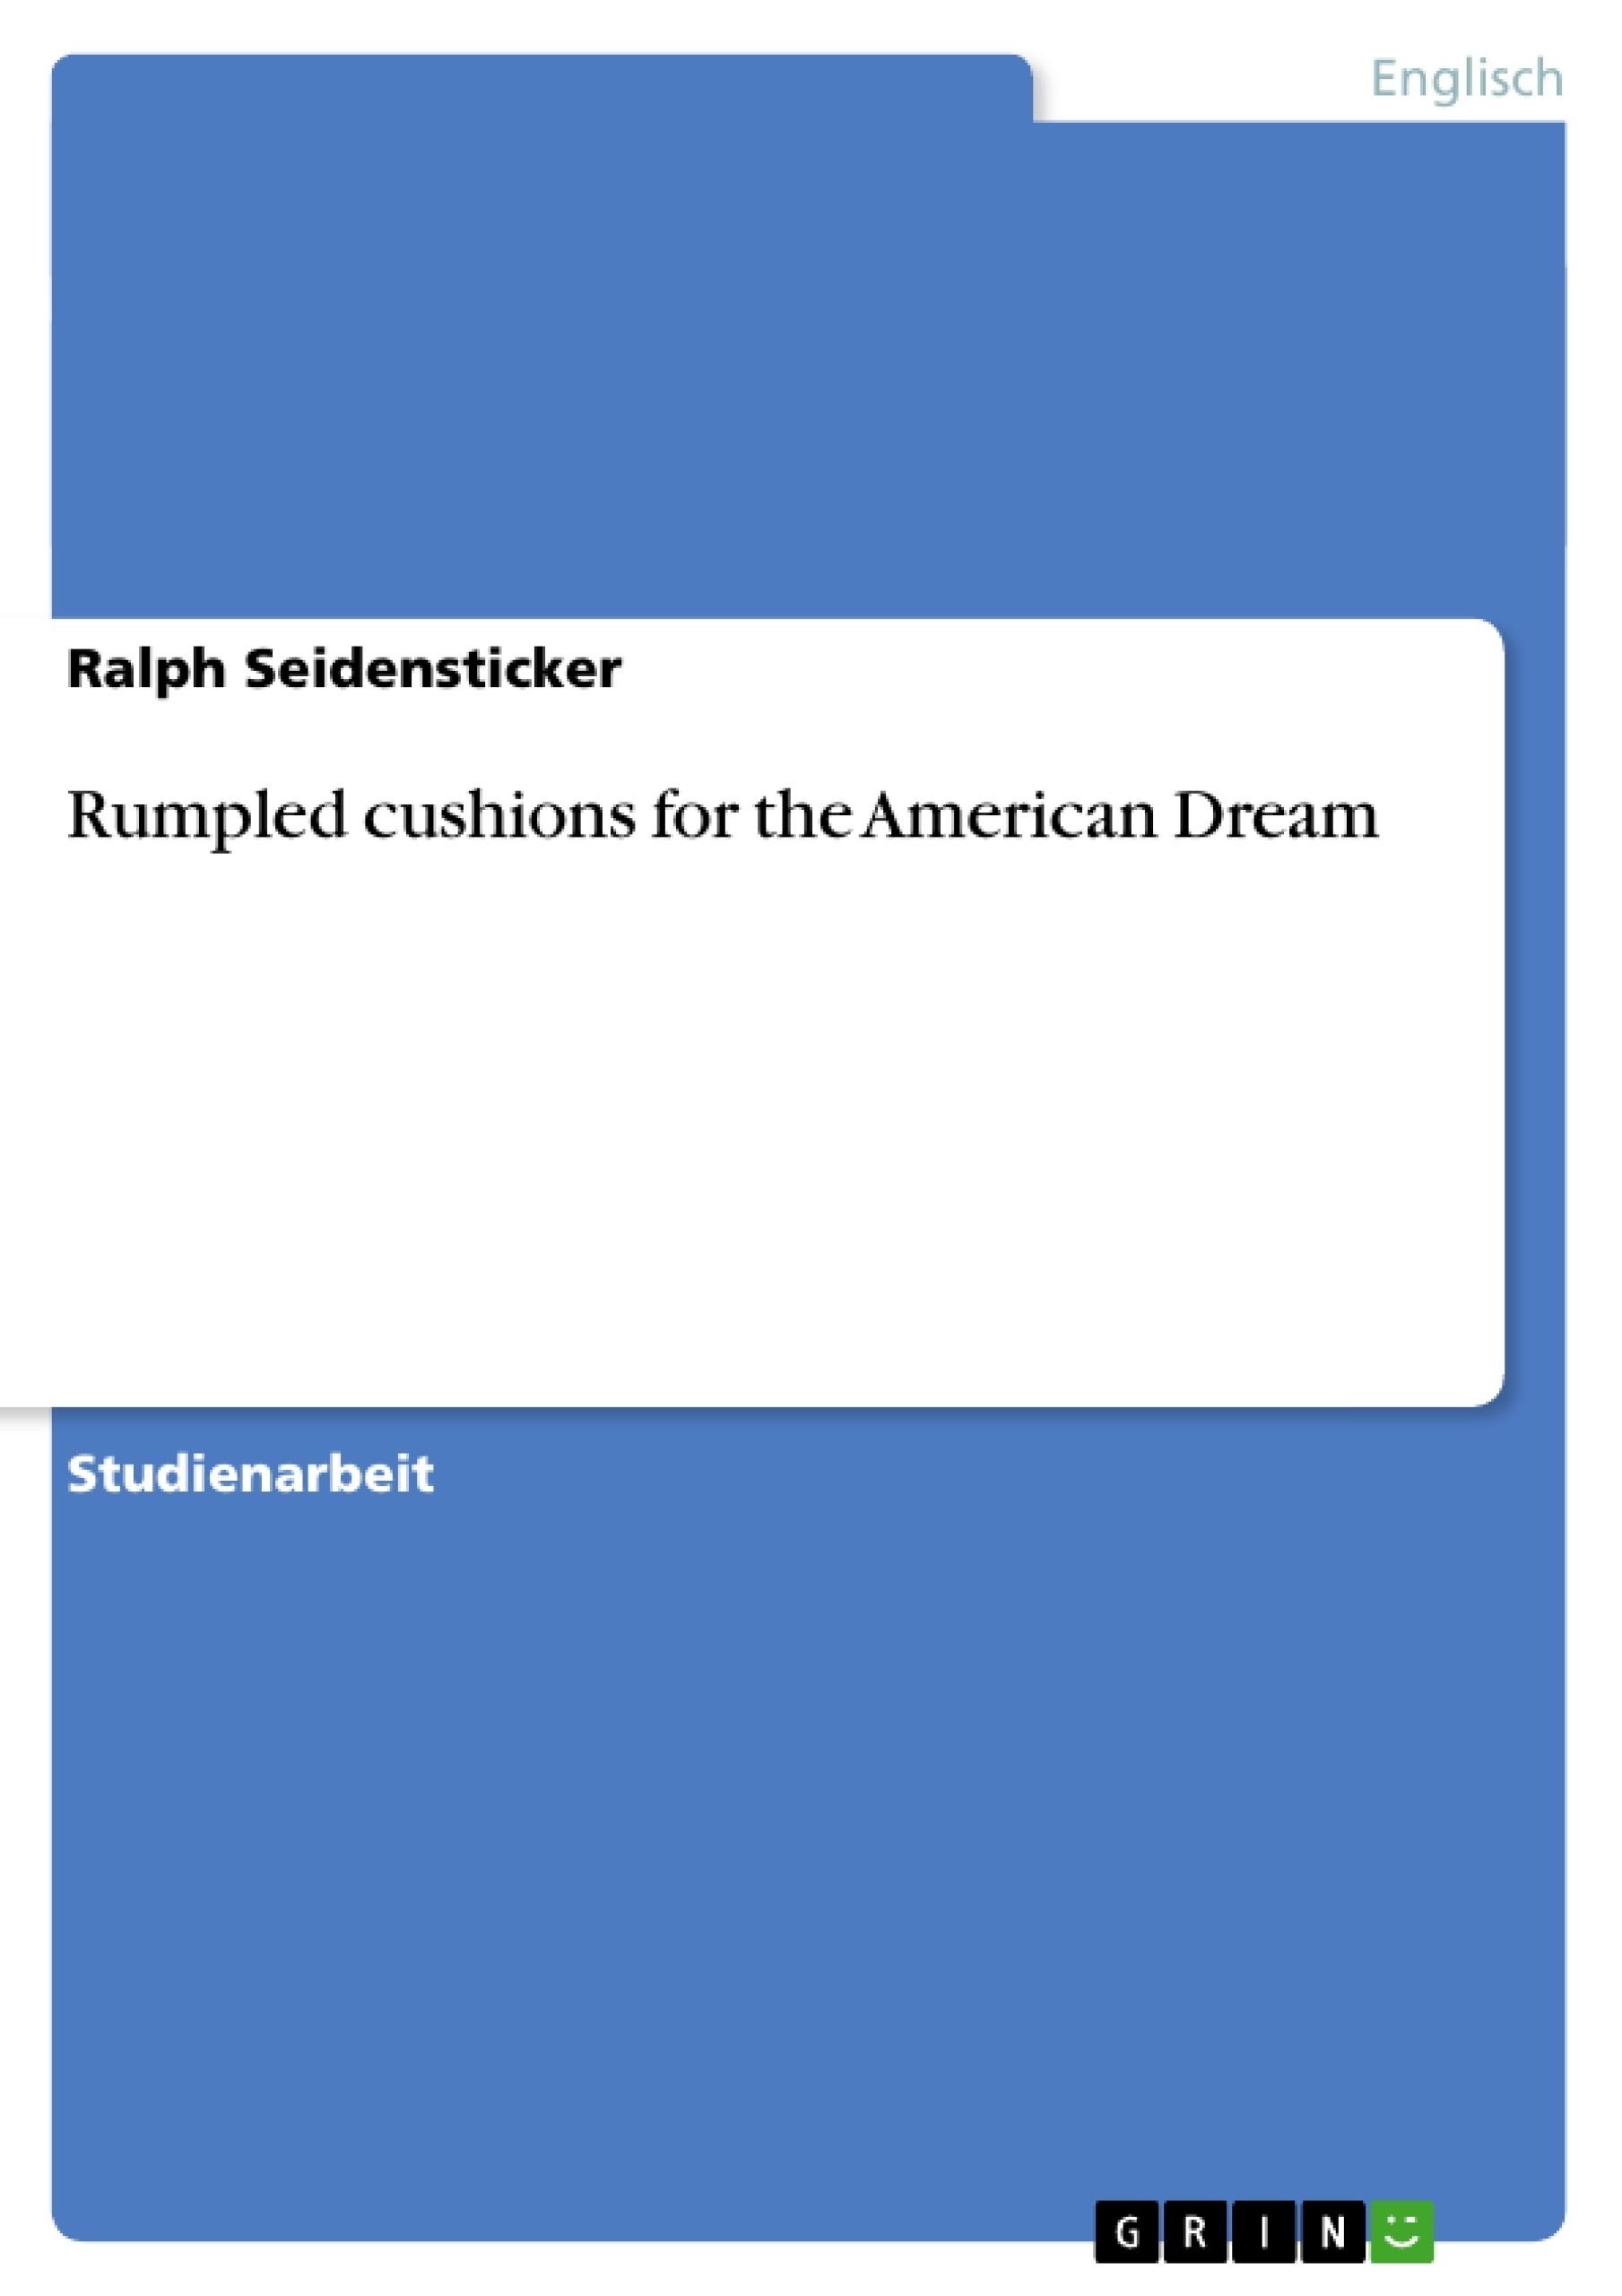 Titel: Rumpled cushions for the American Dream